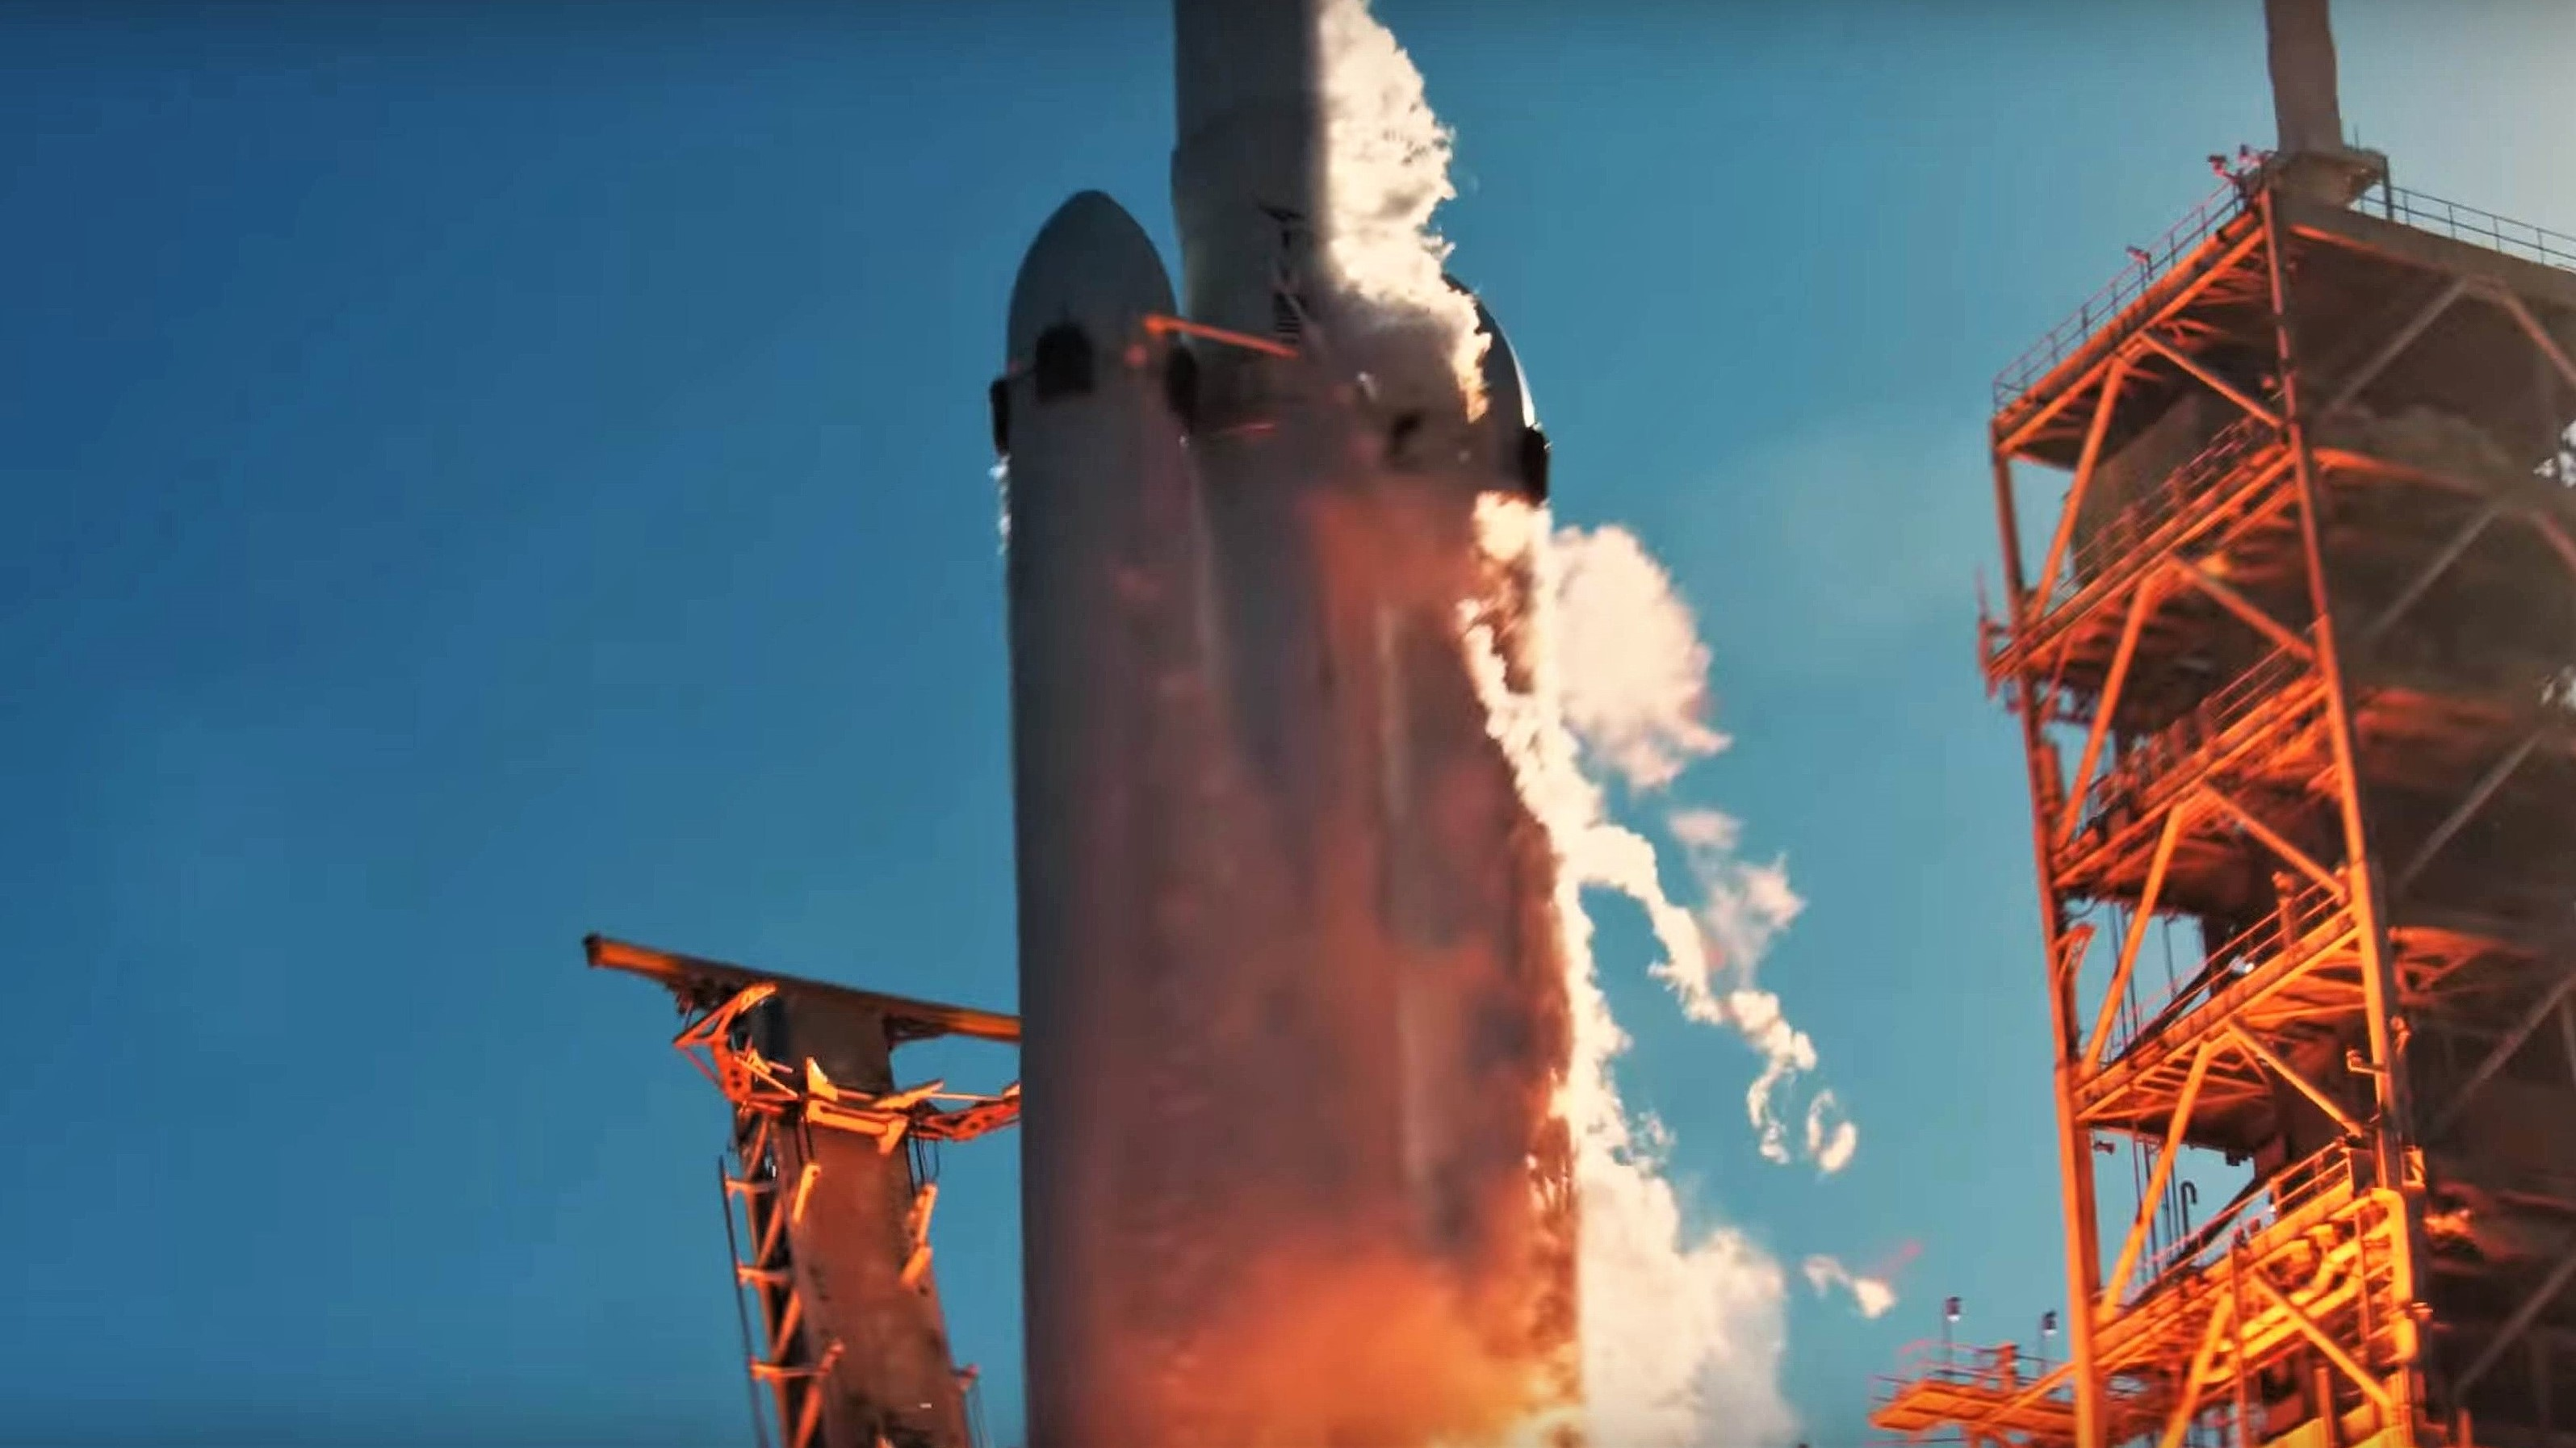 Falcon Heavy Flight 1 liftoff (SpaceX) 5 edit